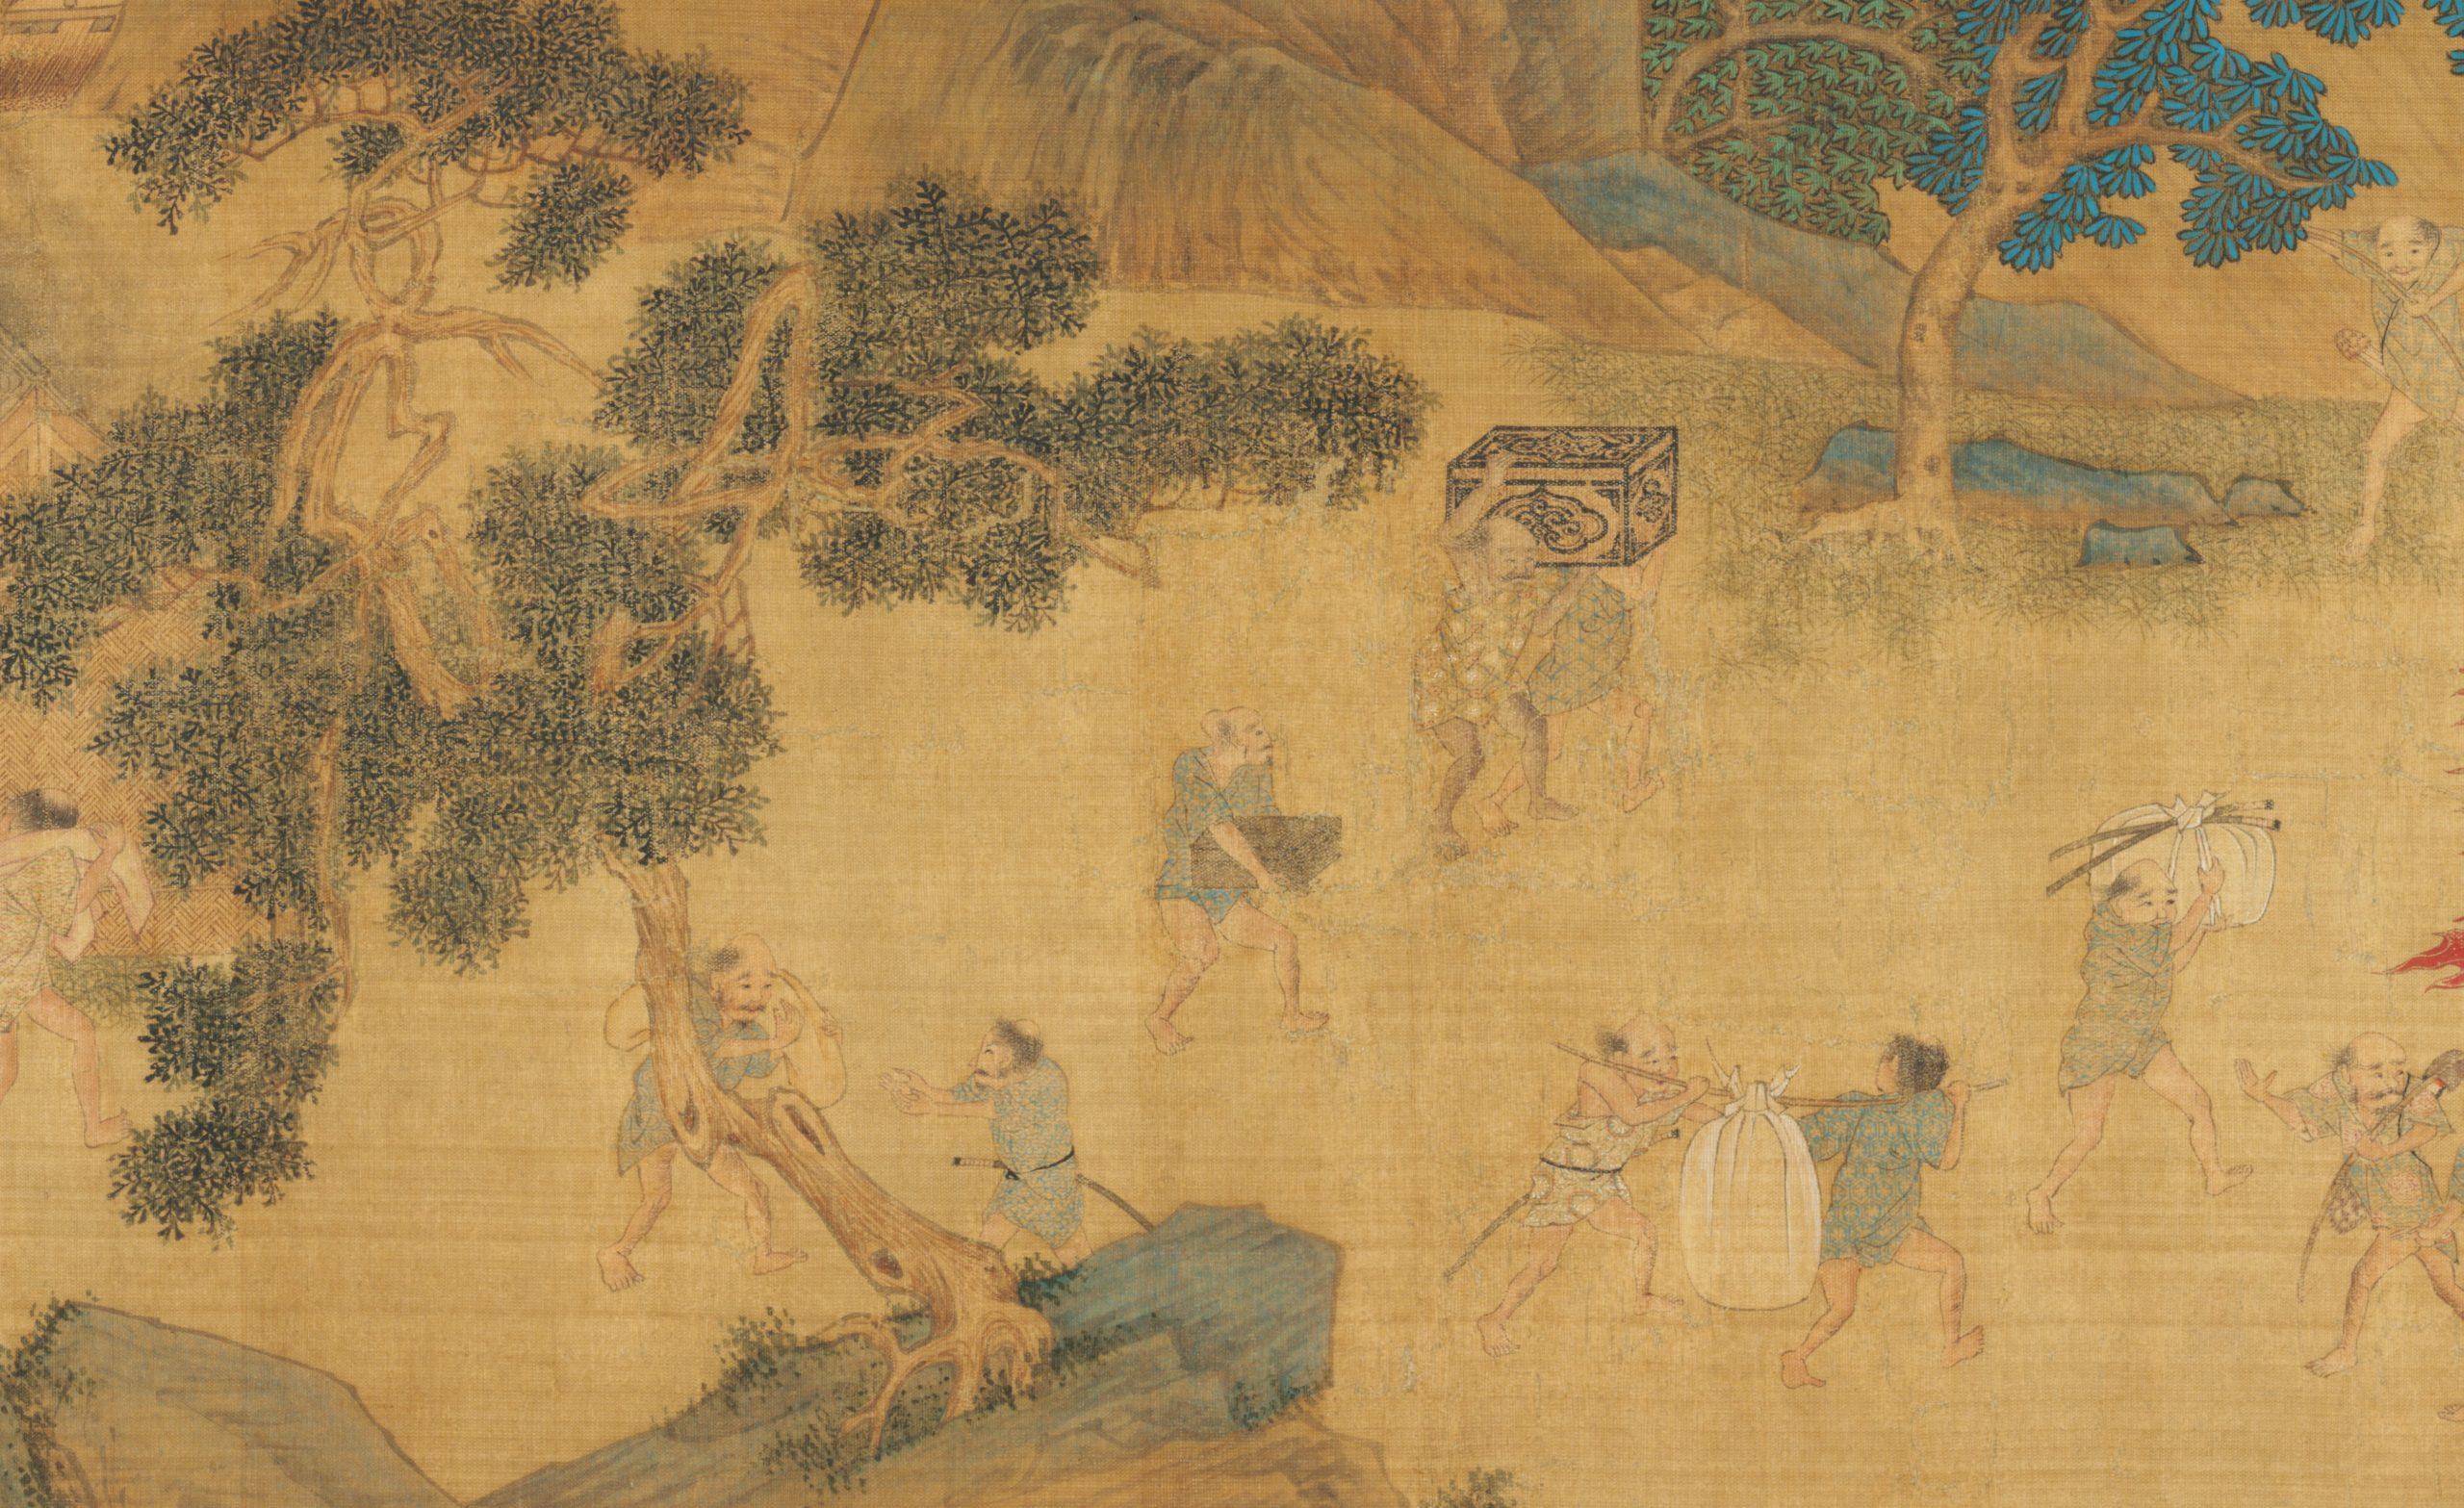 Wakō zukan 倭寇图卷